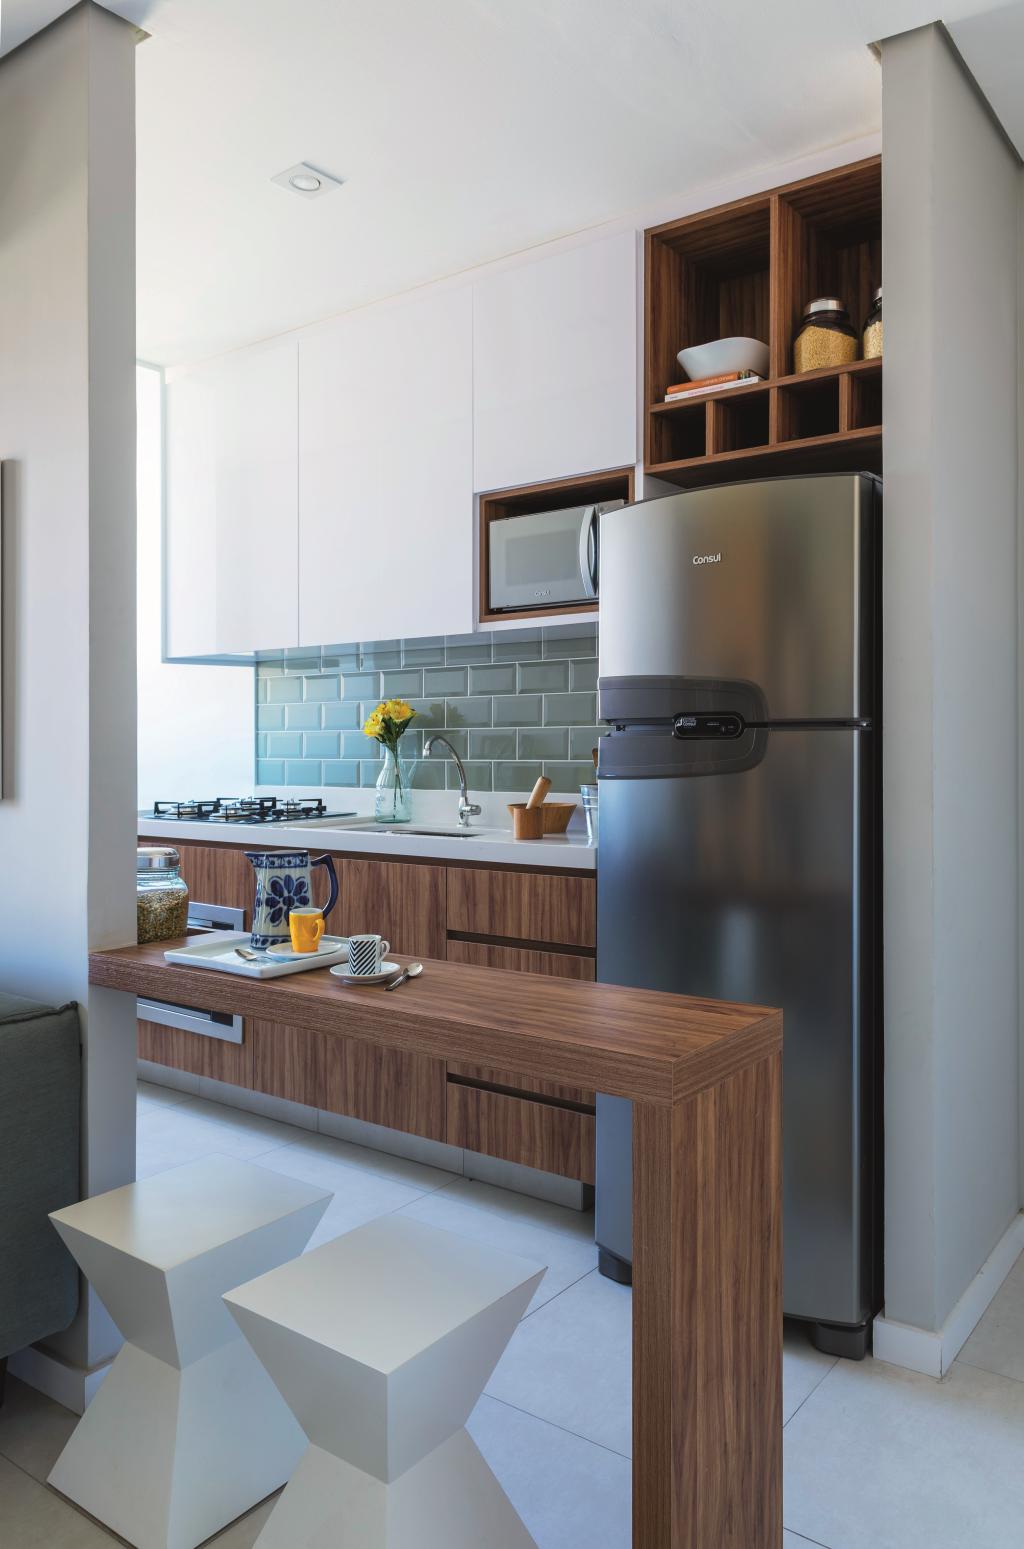 Apartamento pequeno 45 m decorados com charme e estilo for Cocinas en departamentos pequenos